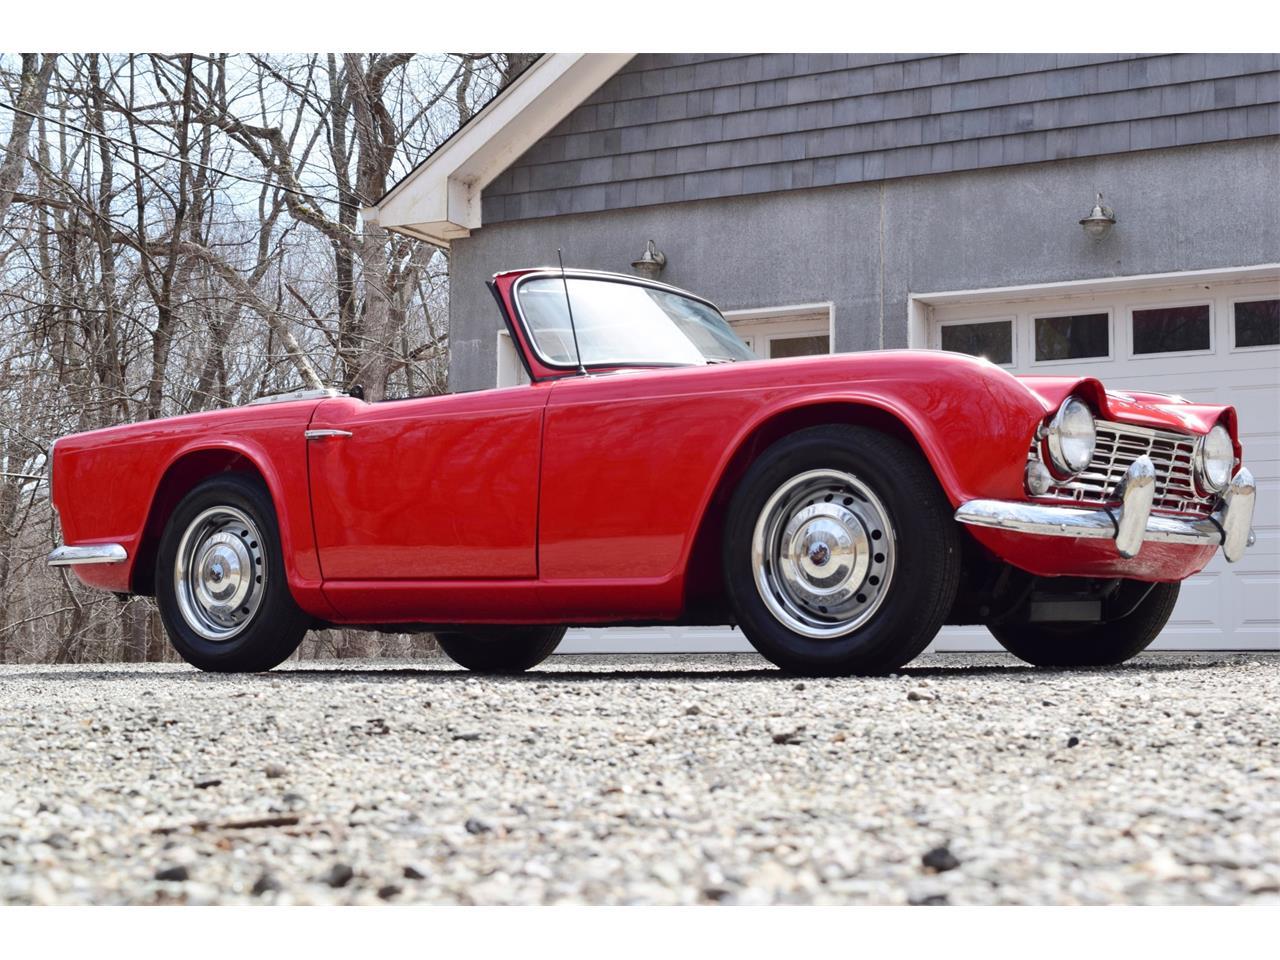 1965 Triumph Tr4 For Sale Classiccarscom Cc 1208992